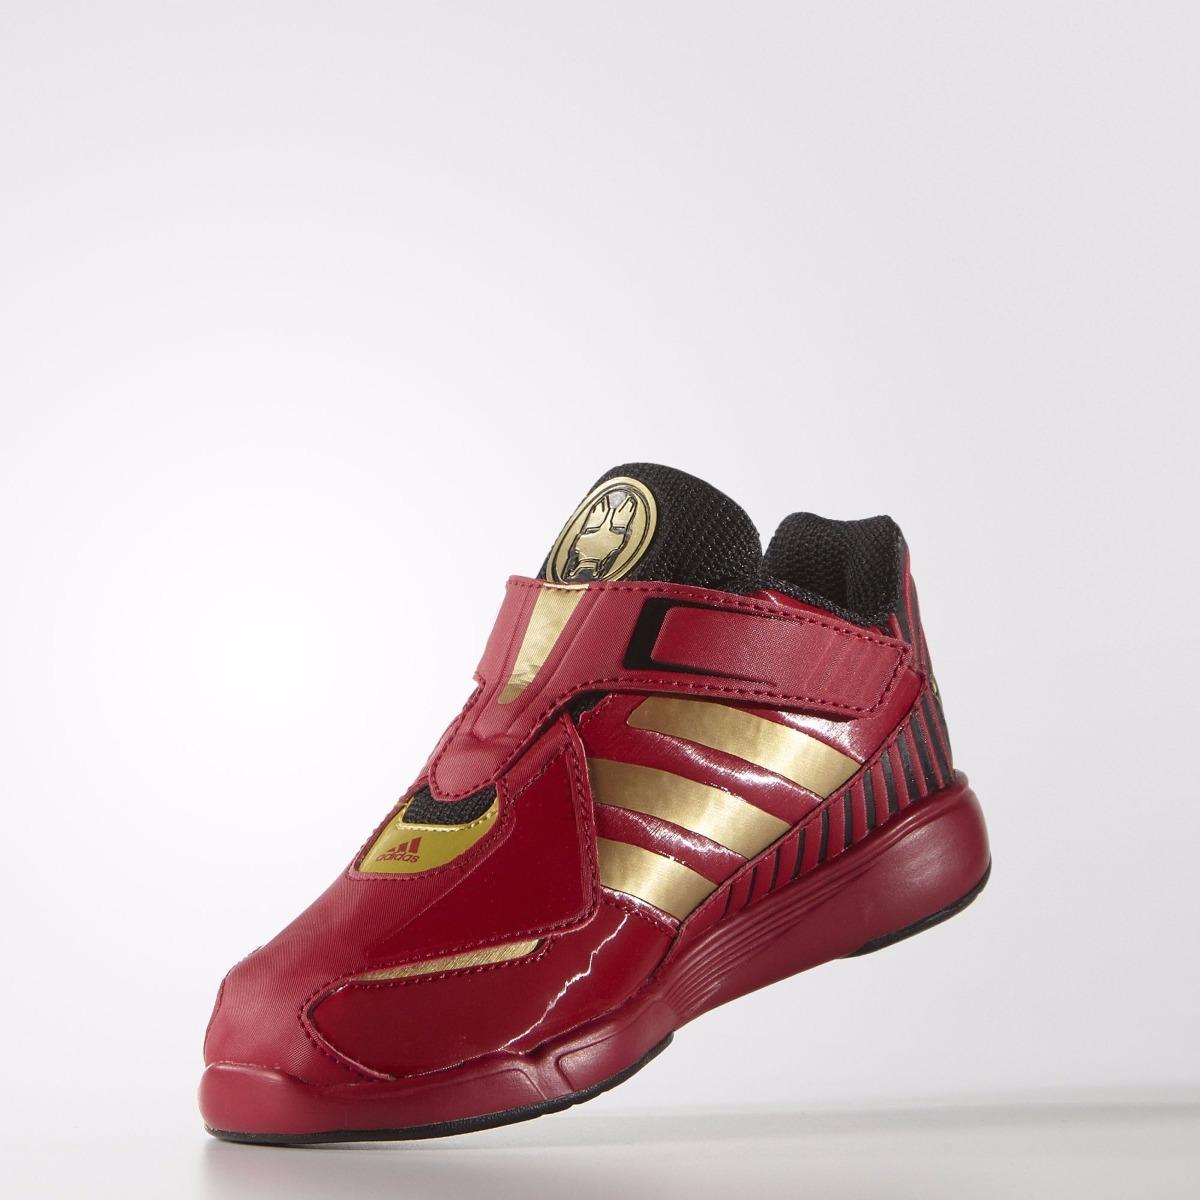 cf645db6e03 Tenis Marvel Disney Avengers Iron Man Niño adidas Af3988 -   649.00 ...